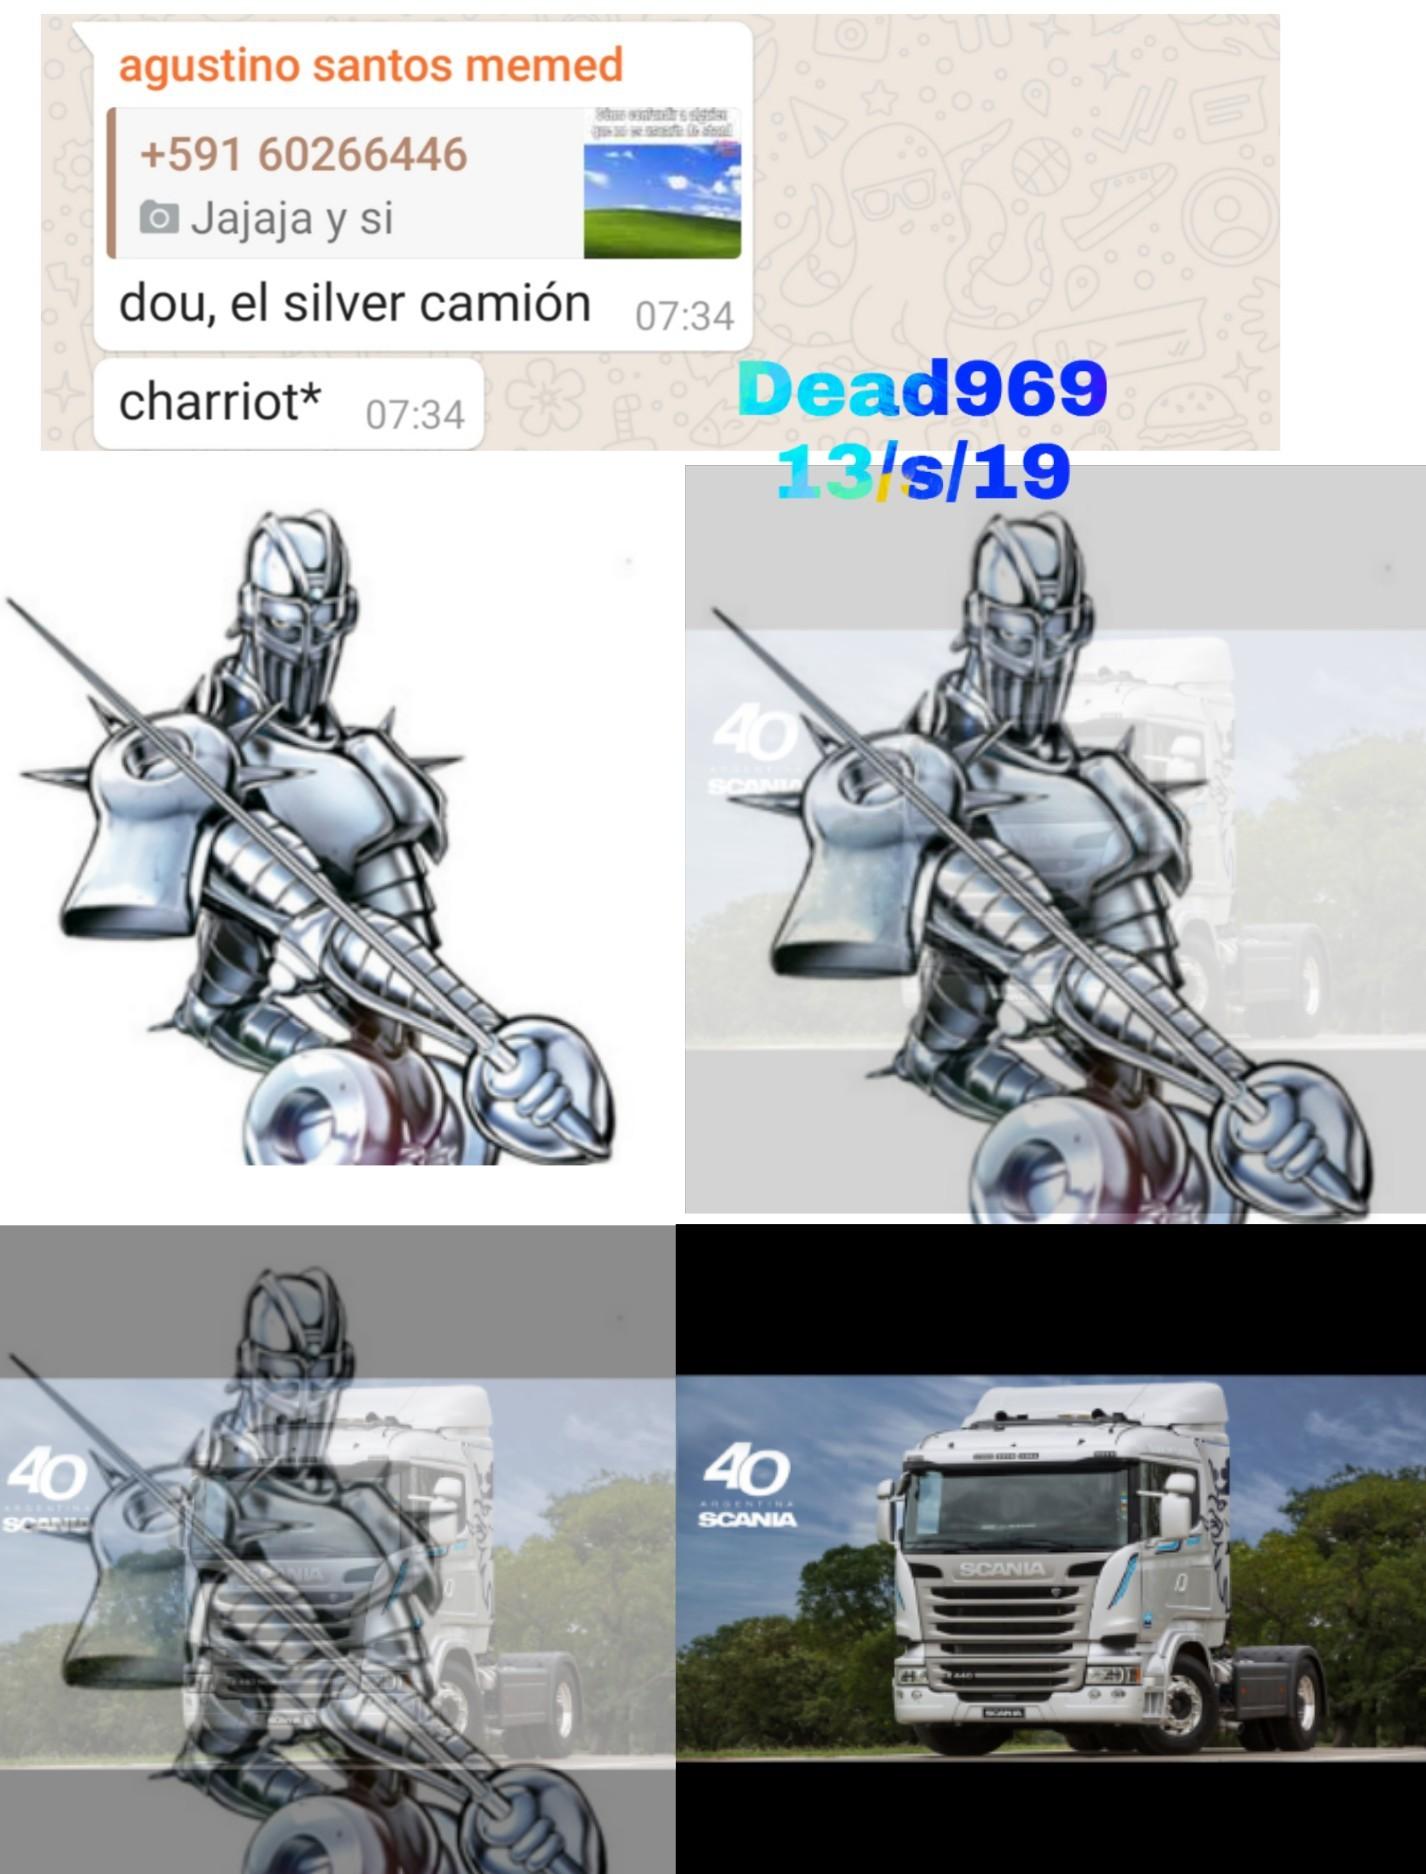 silver camion! - meme